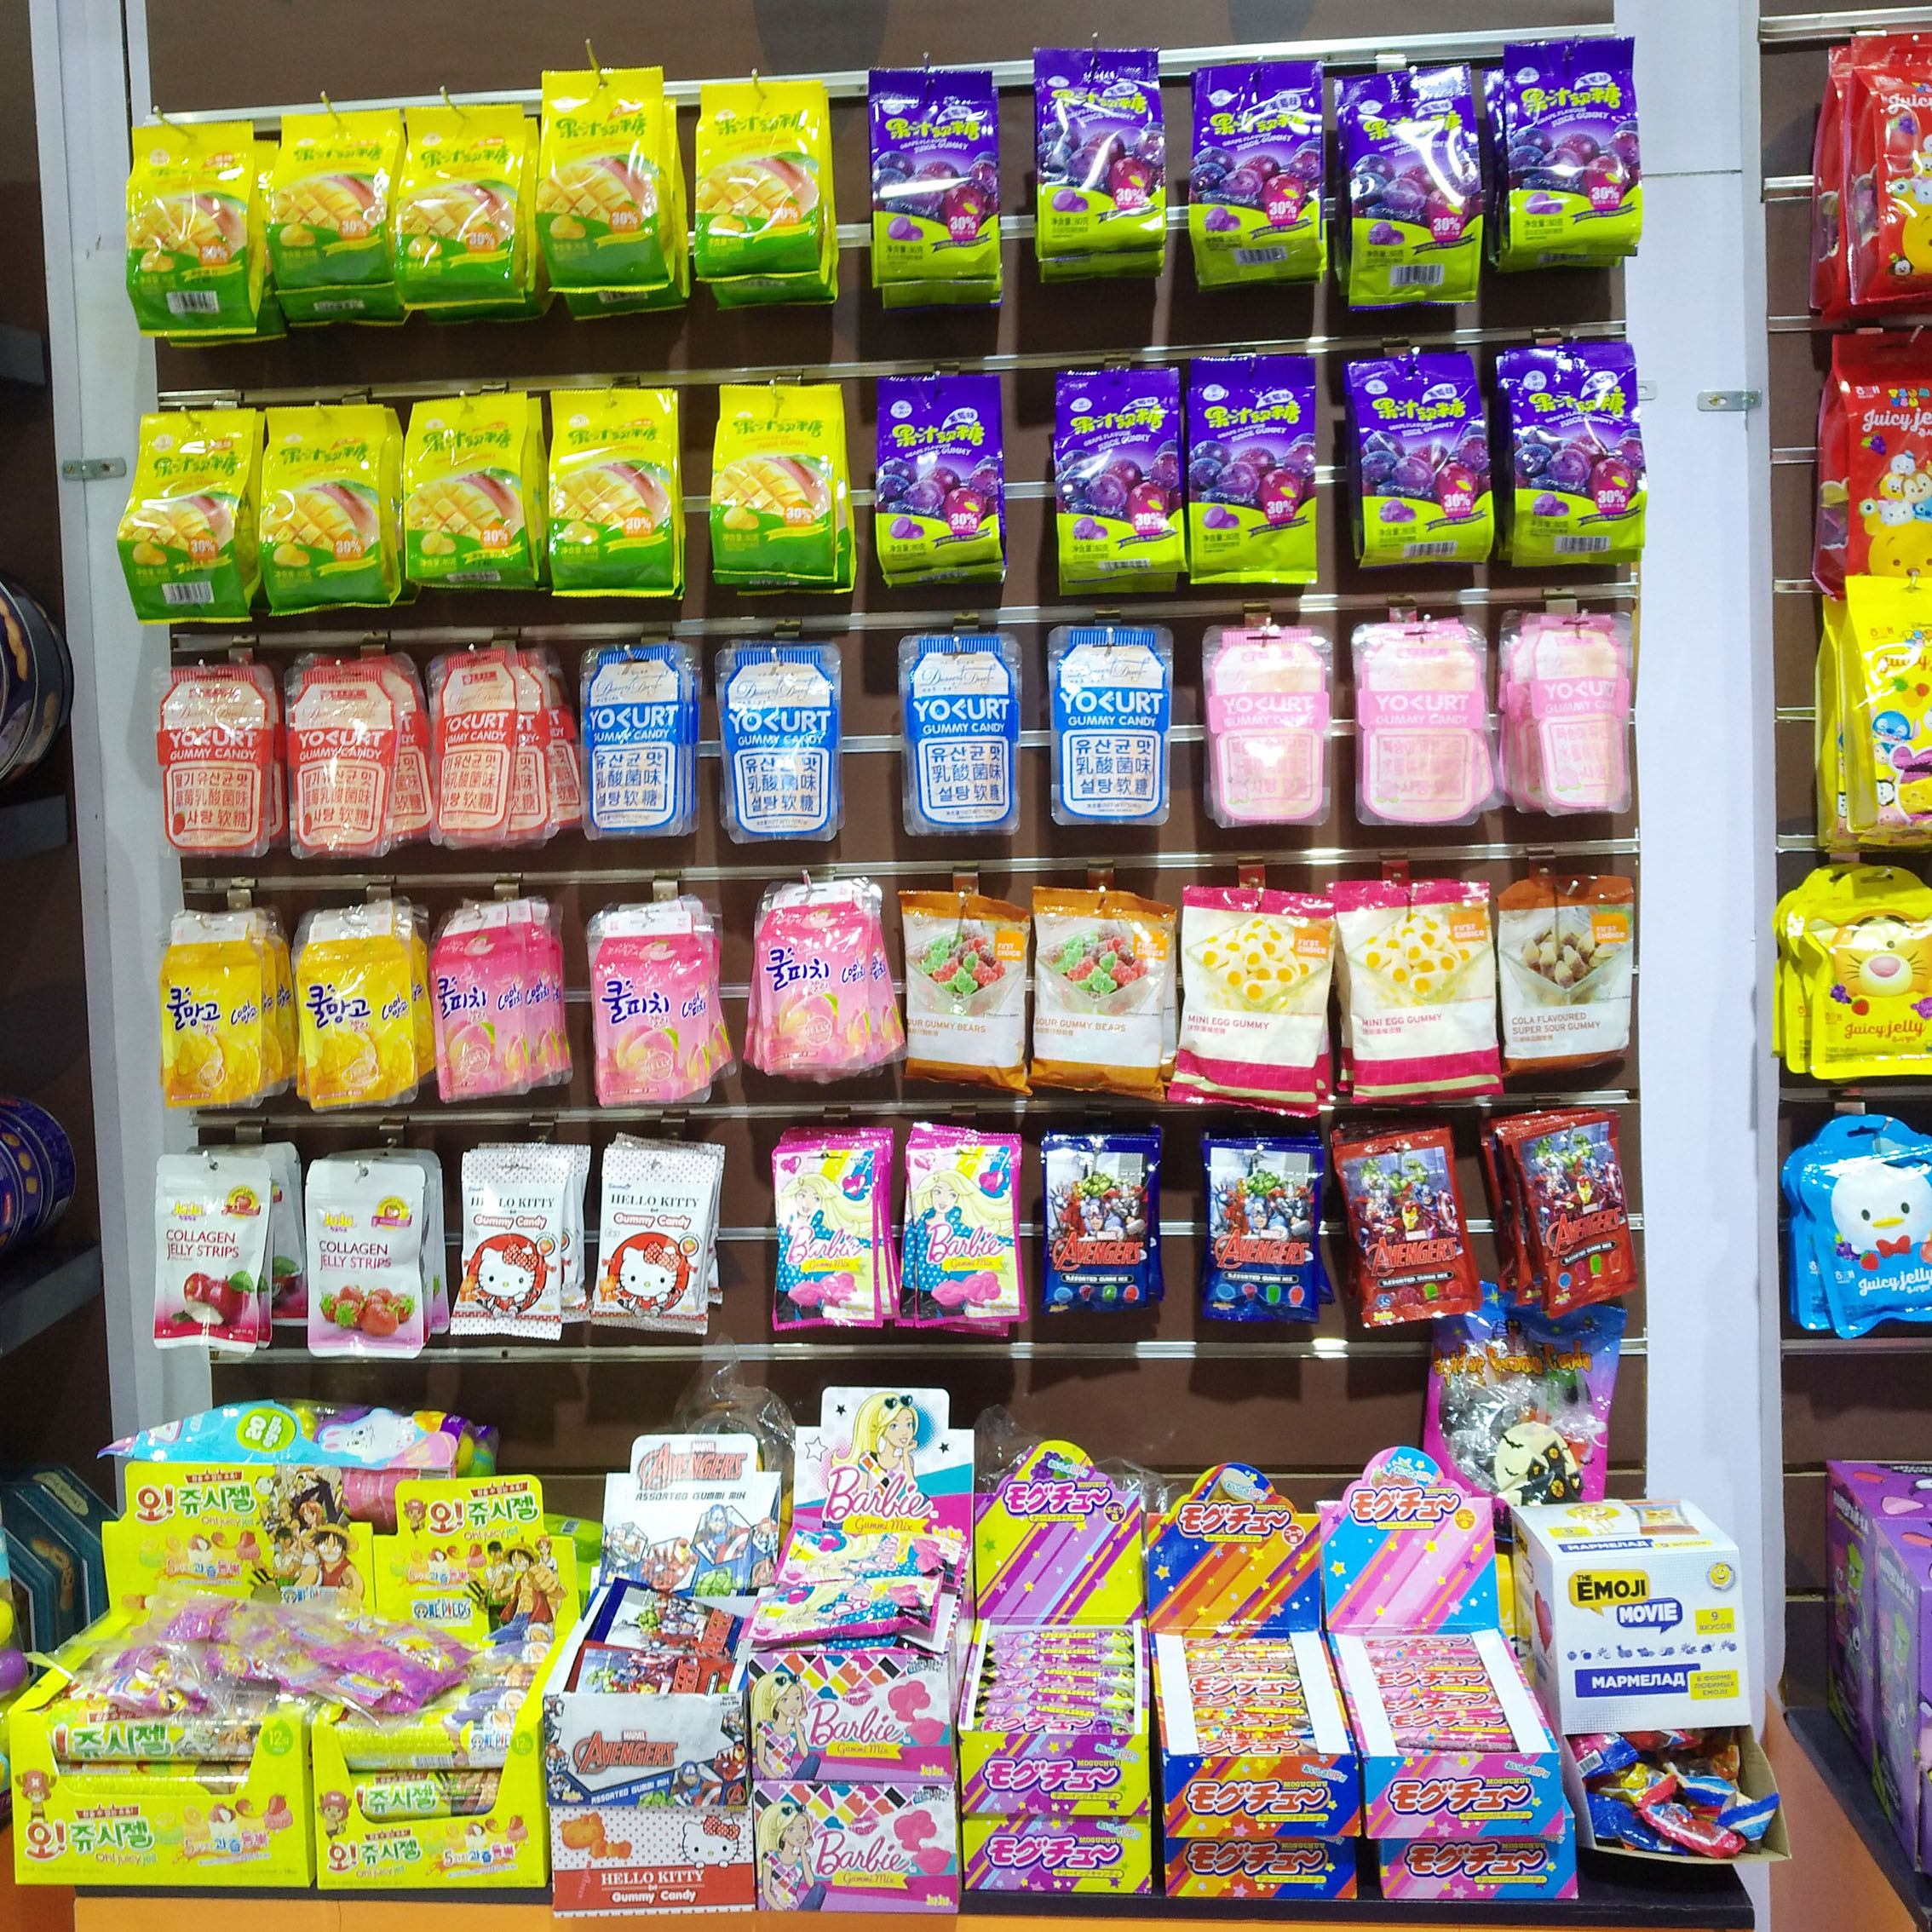 Dringo Canton Fair Butter Cookie Gummy Candies